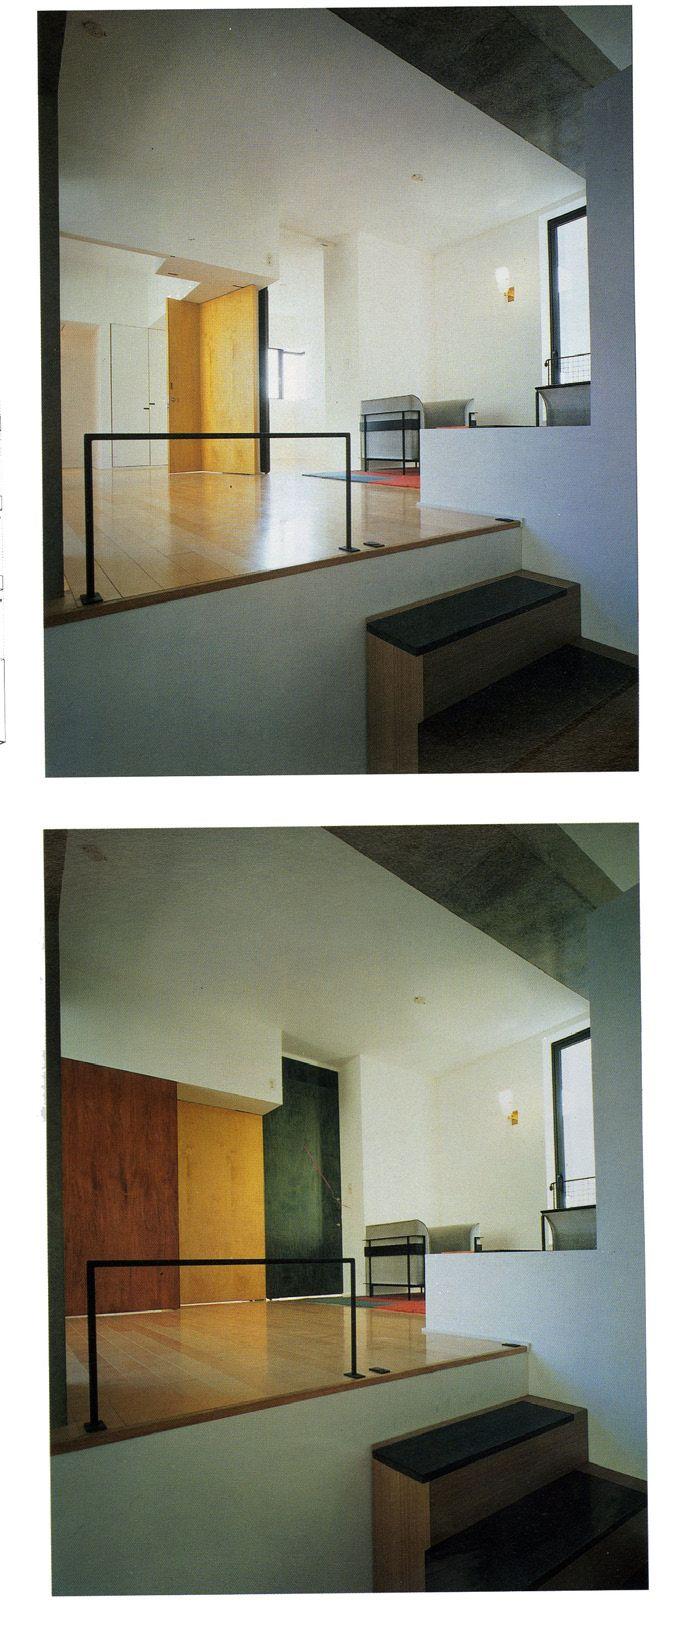 steven holl fukuoka housing japan ademend appartement micro